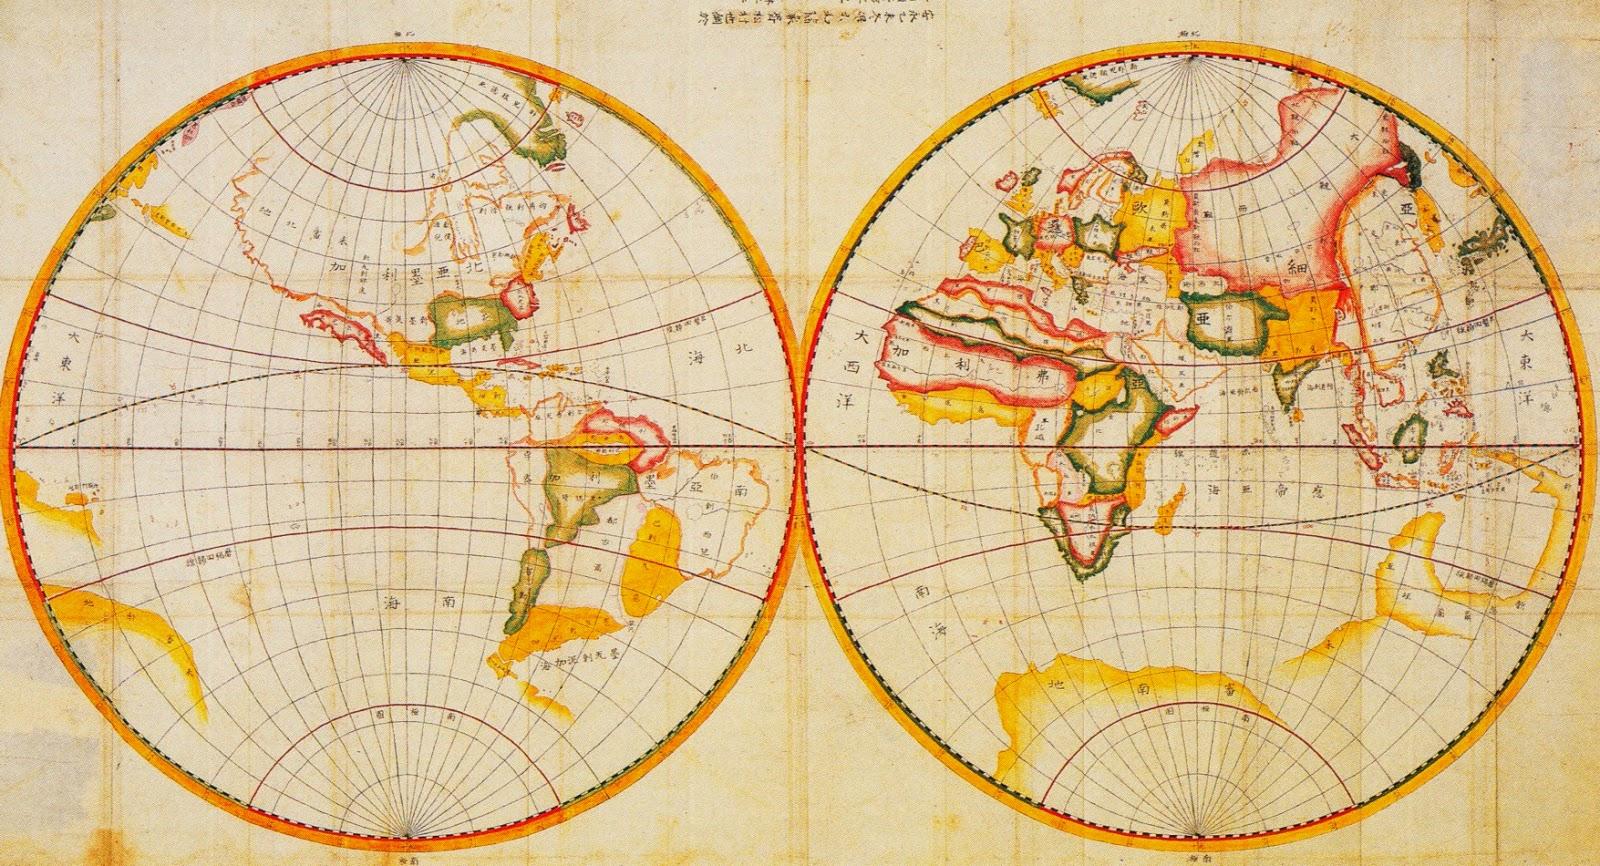 world, globe, map, japan, historical, postcard